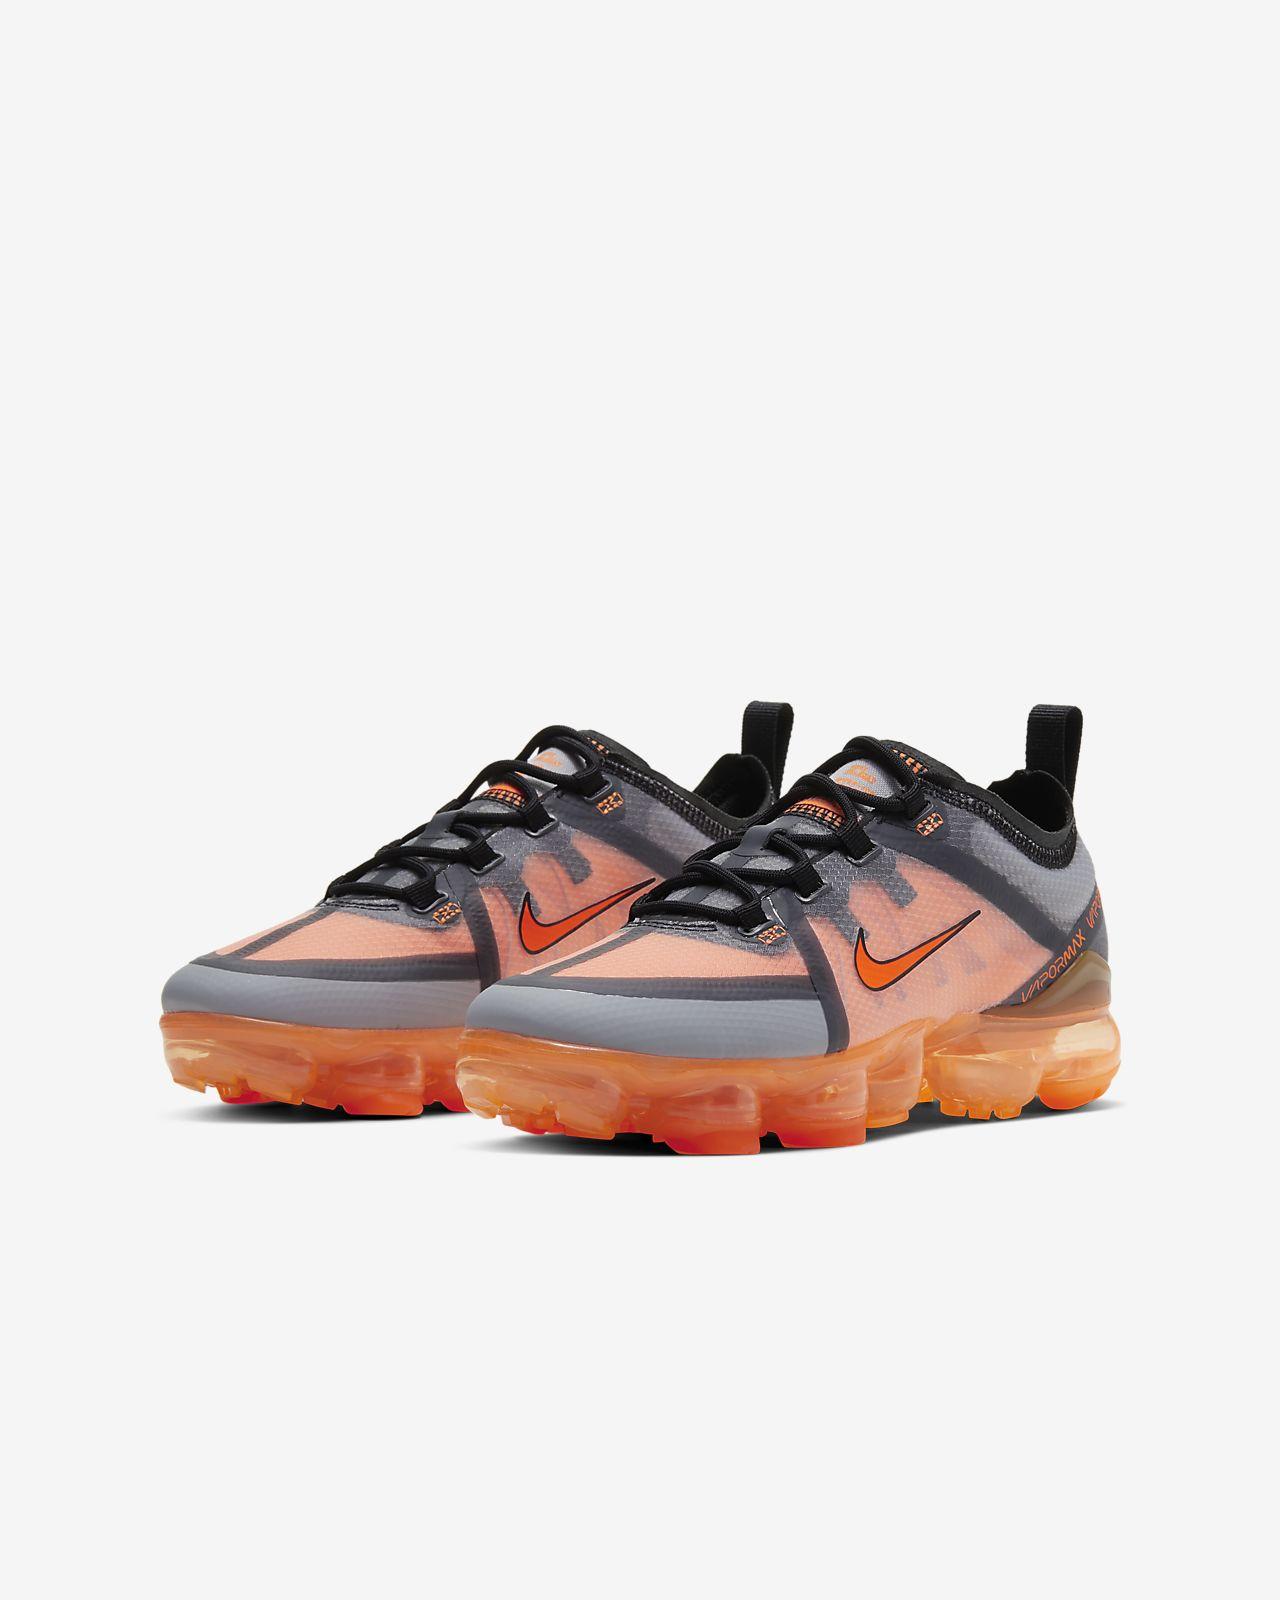 nike scarpe vapormax ragazzo